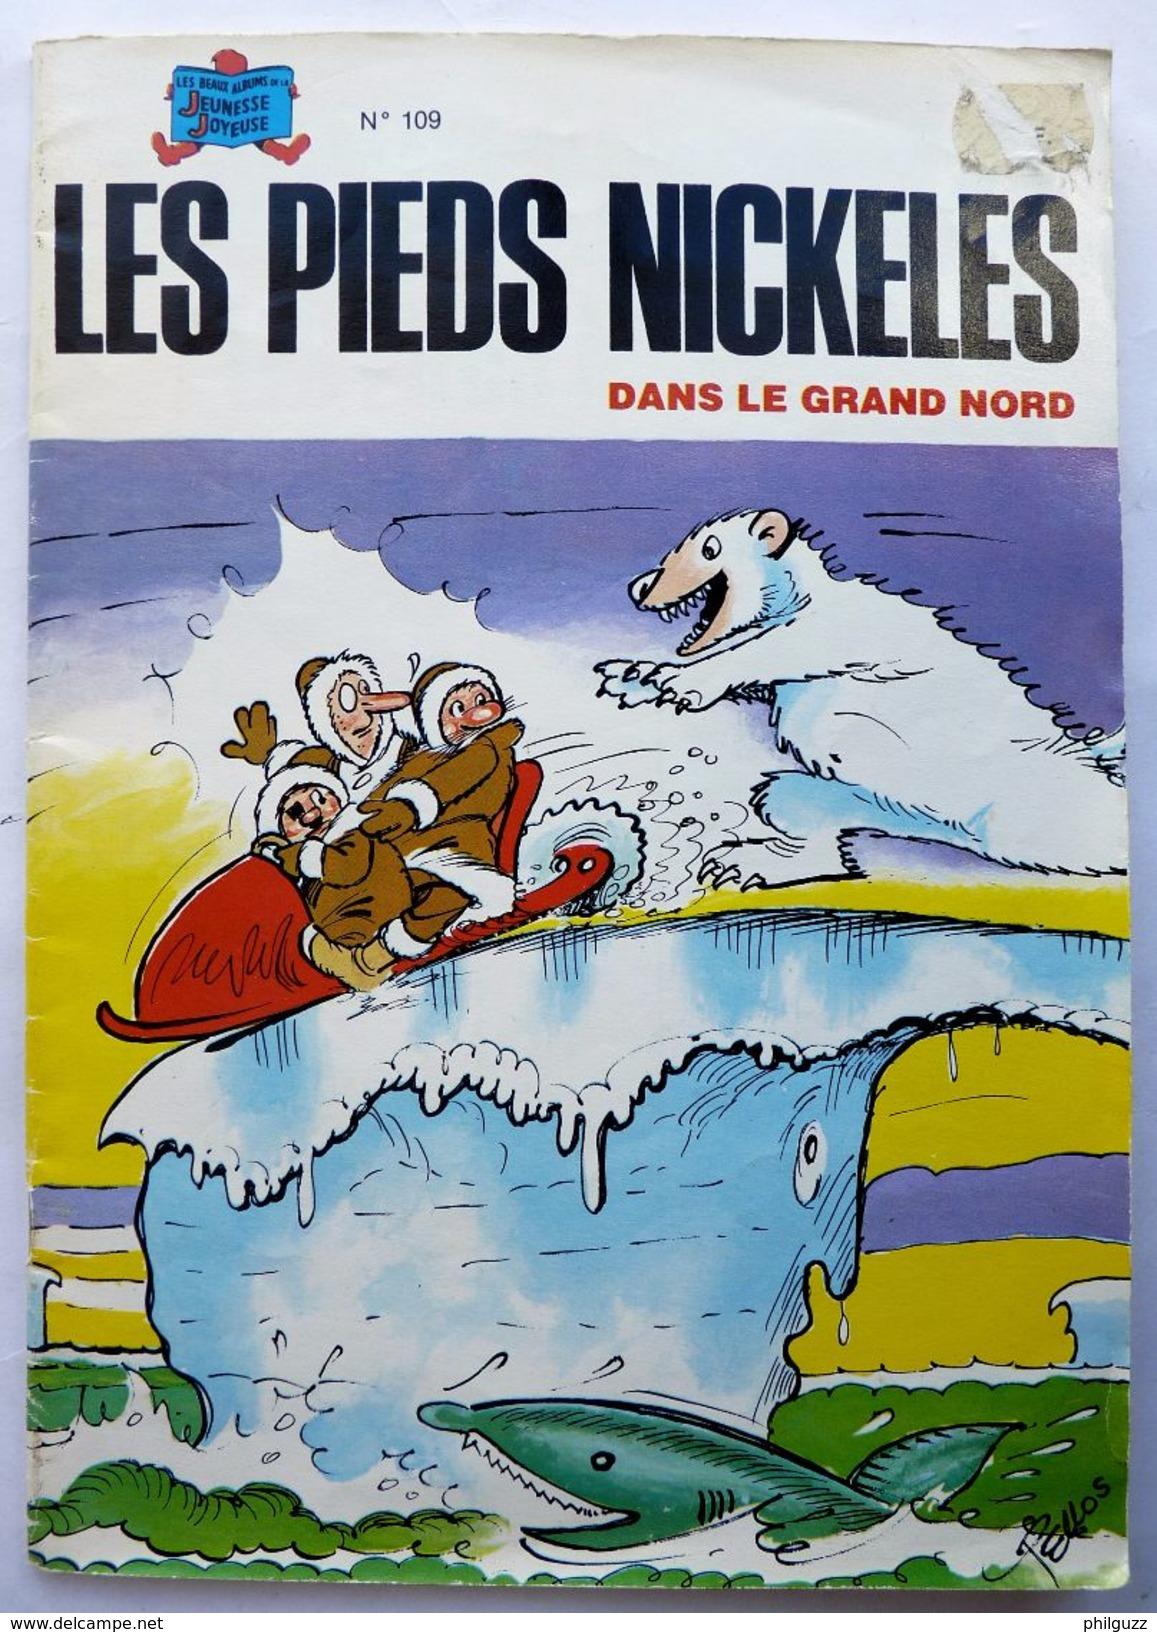 LES PIEDS NICKELES 109 DANS LE GRAND NORD - SPE - PELLOS - Pieds Nickelés, Les